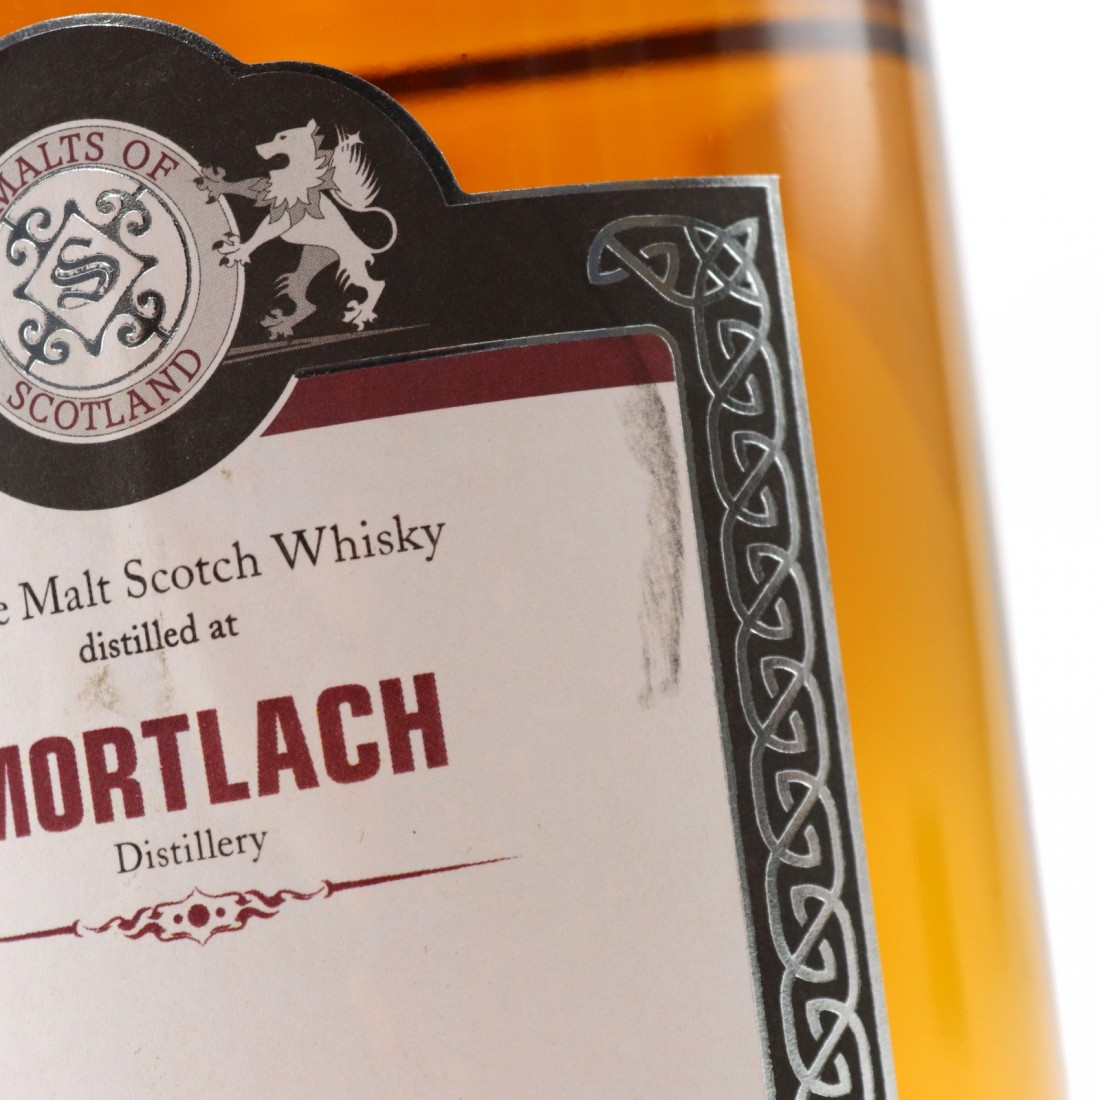 Mortlach 1997 Malts of Scotland